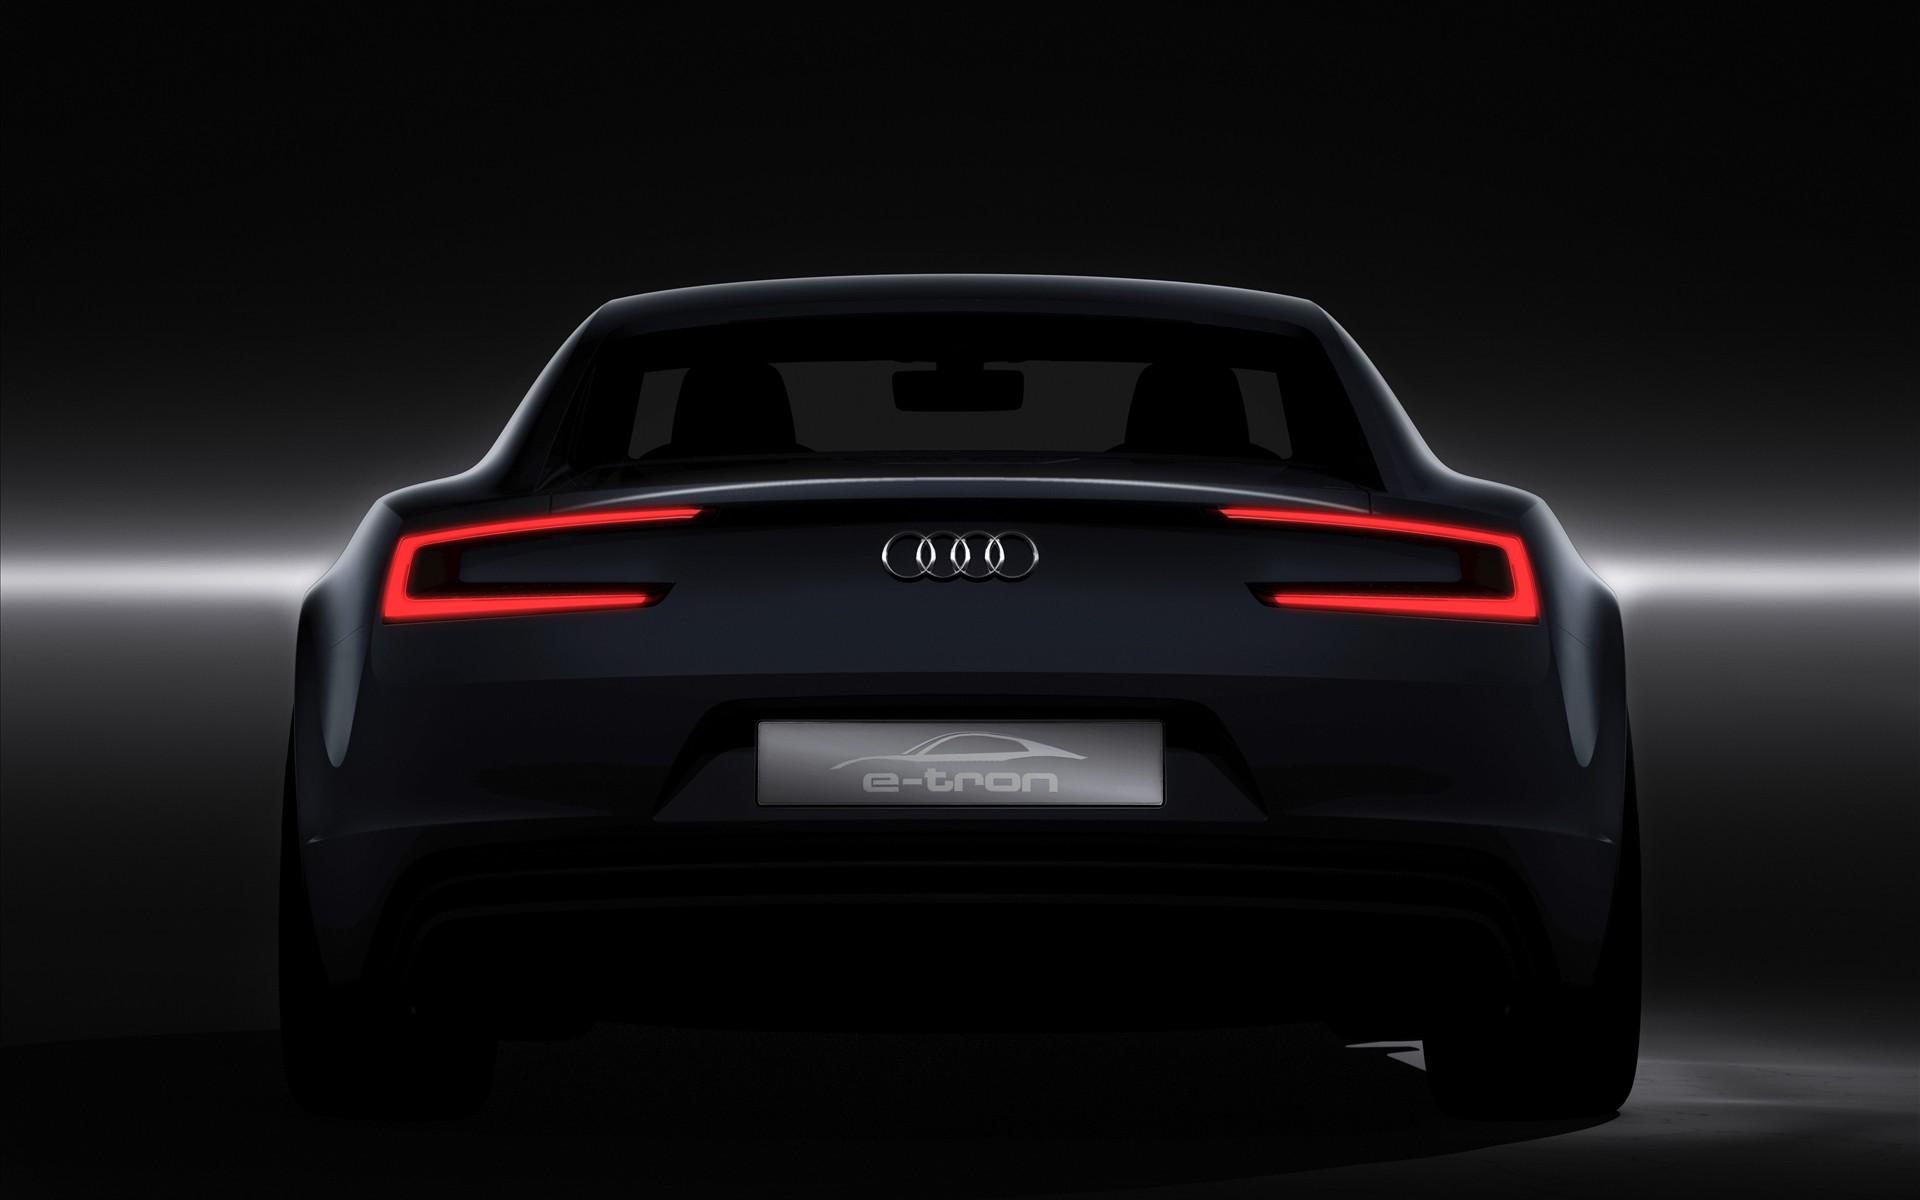 Black Audi Cars Wallpapers Hd 1920x1200 Wallpaper Teahub Io